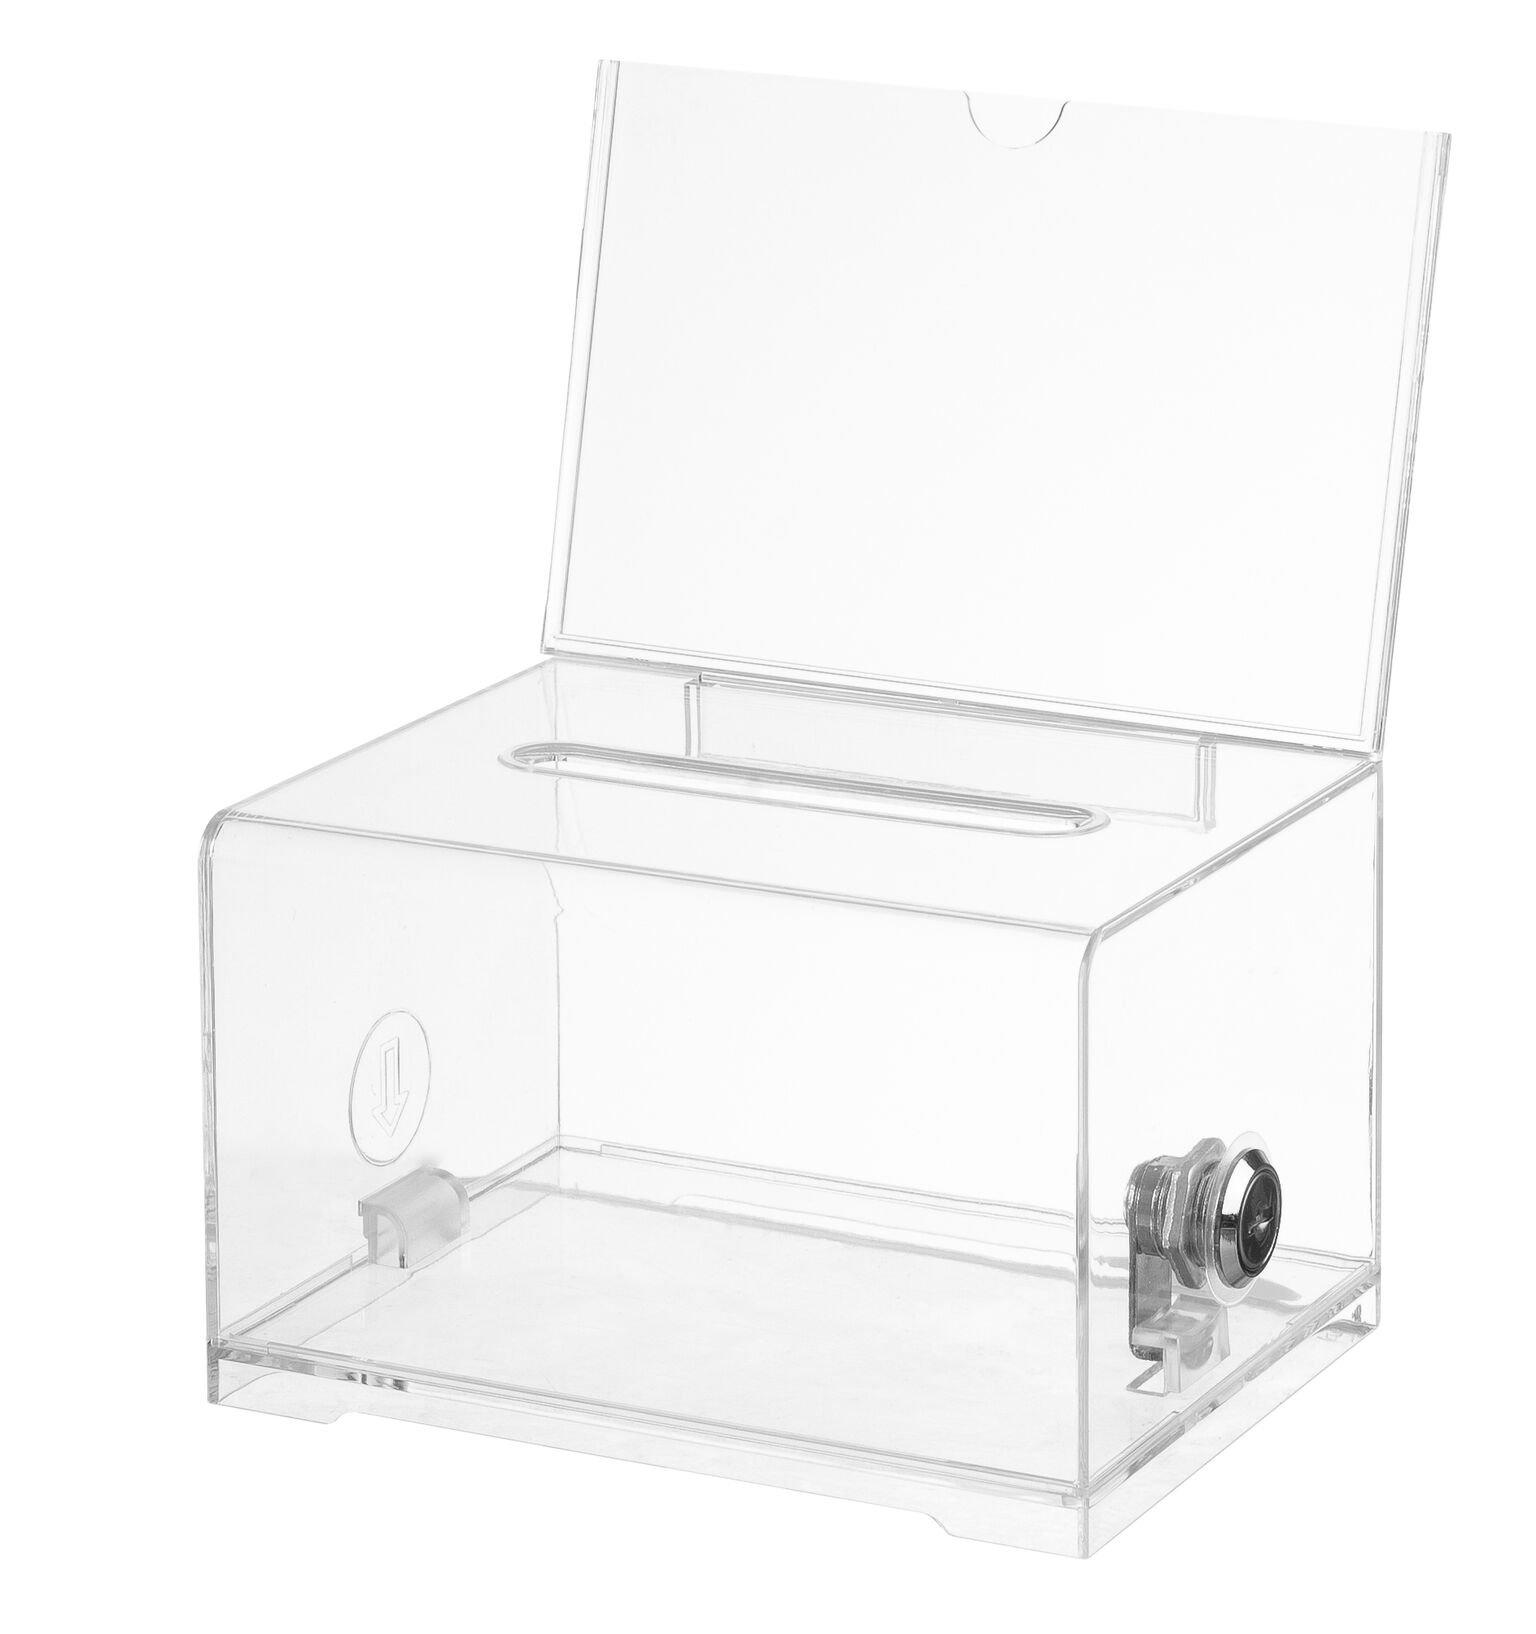 AdirOffice Acrylic Donation & Ballot Box With Lock (6.25'' x 4.5'' x 4'') - Clear